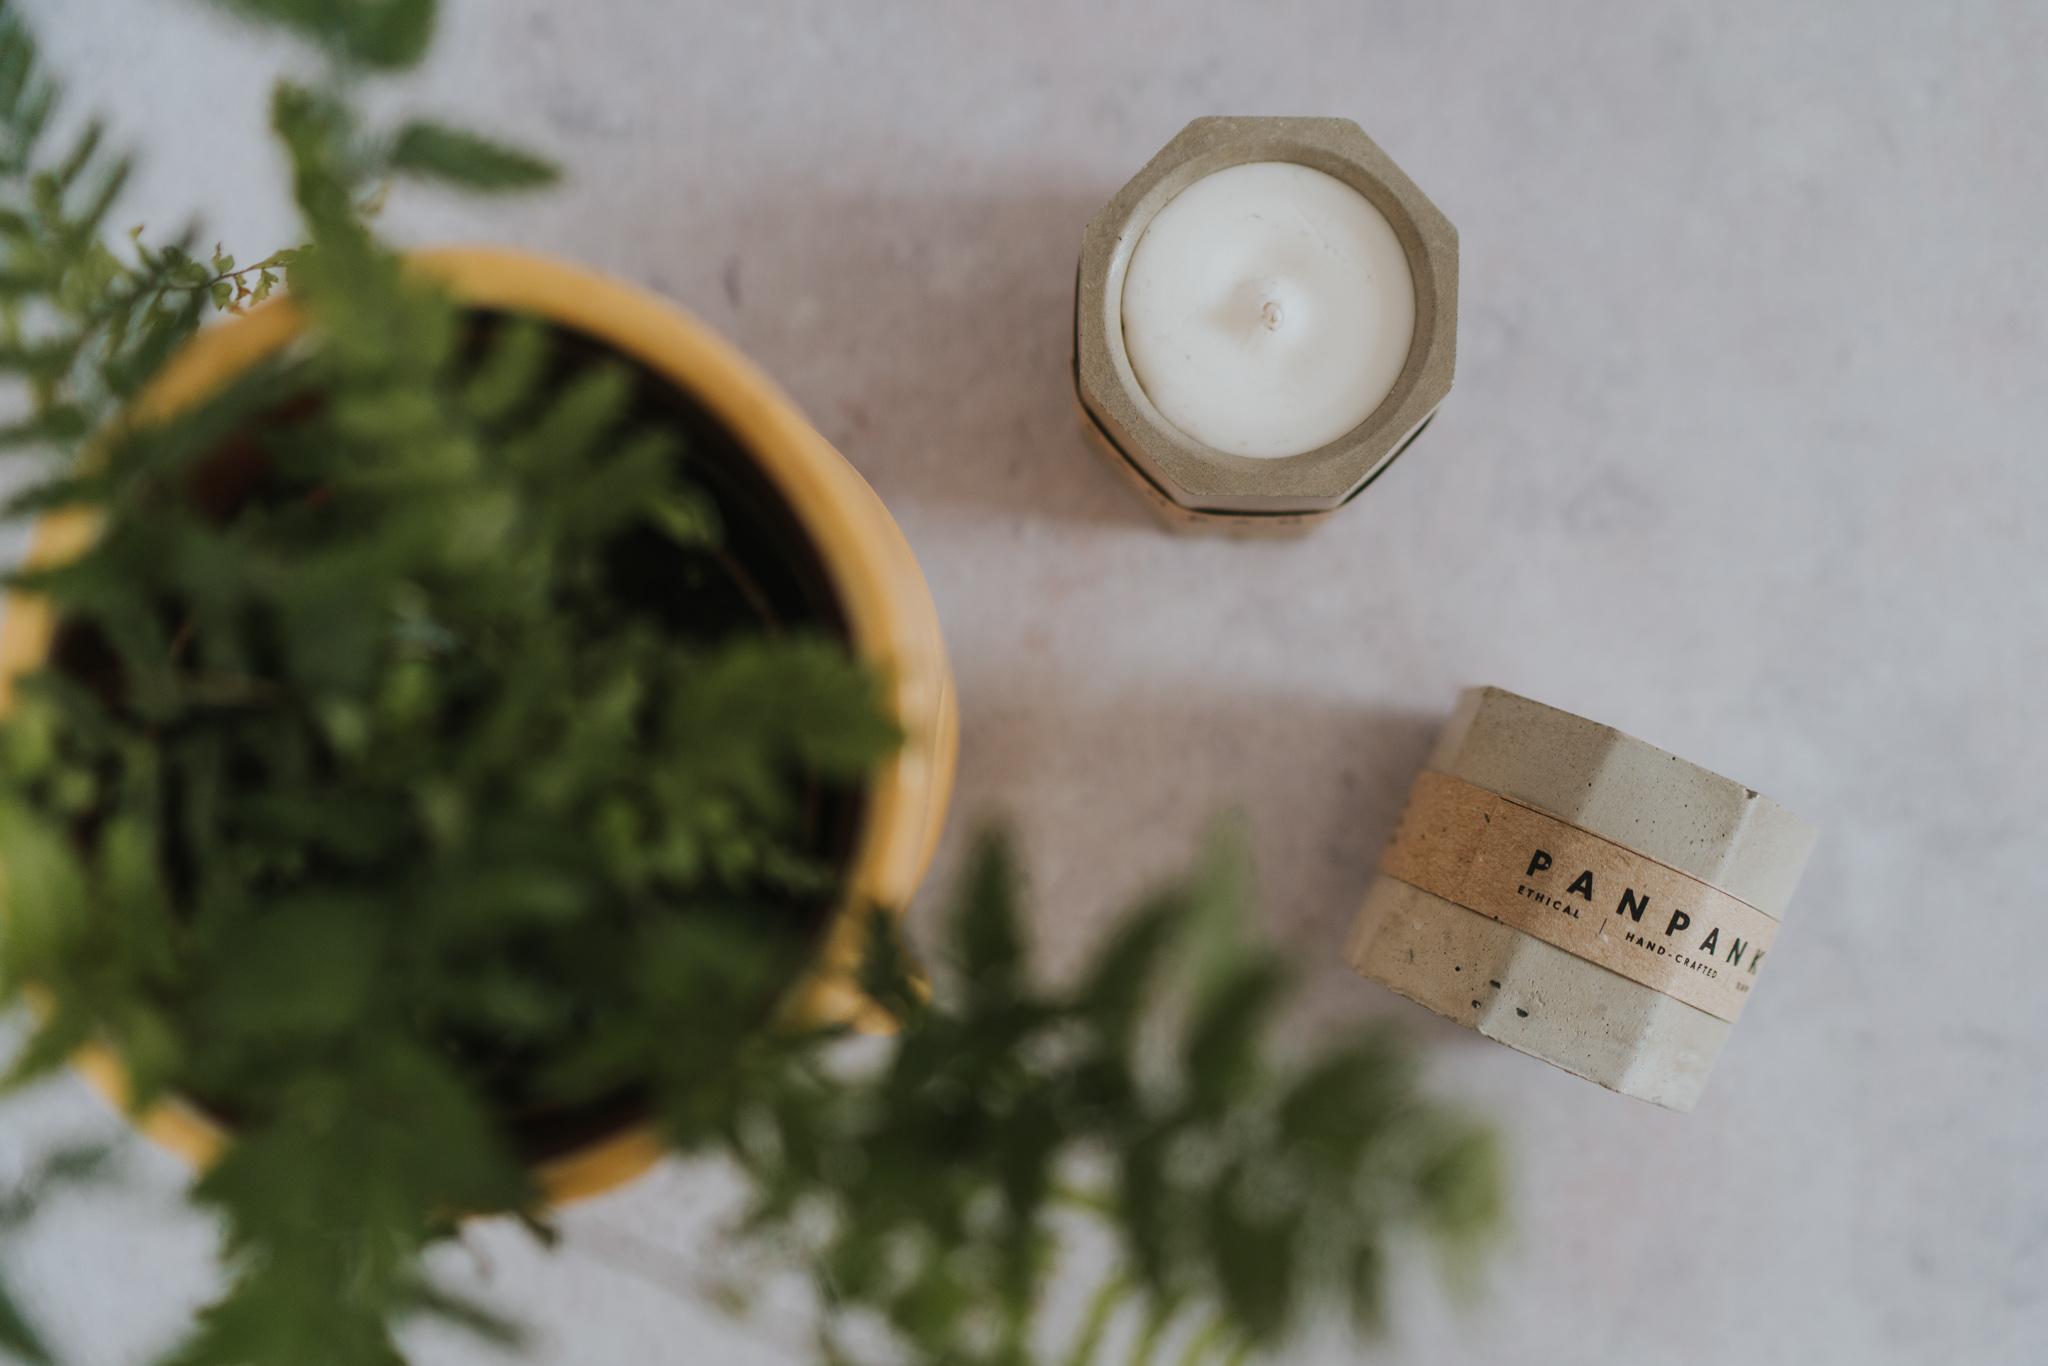 business-branding-panpank-candles-grace-elizabeth-colchester-essex-devon-suffolk-and-norfolk-alternative-wedding-and-family-photographer (2 of 19).jpg